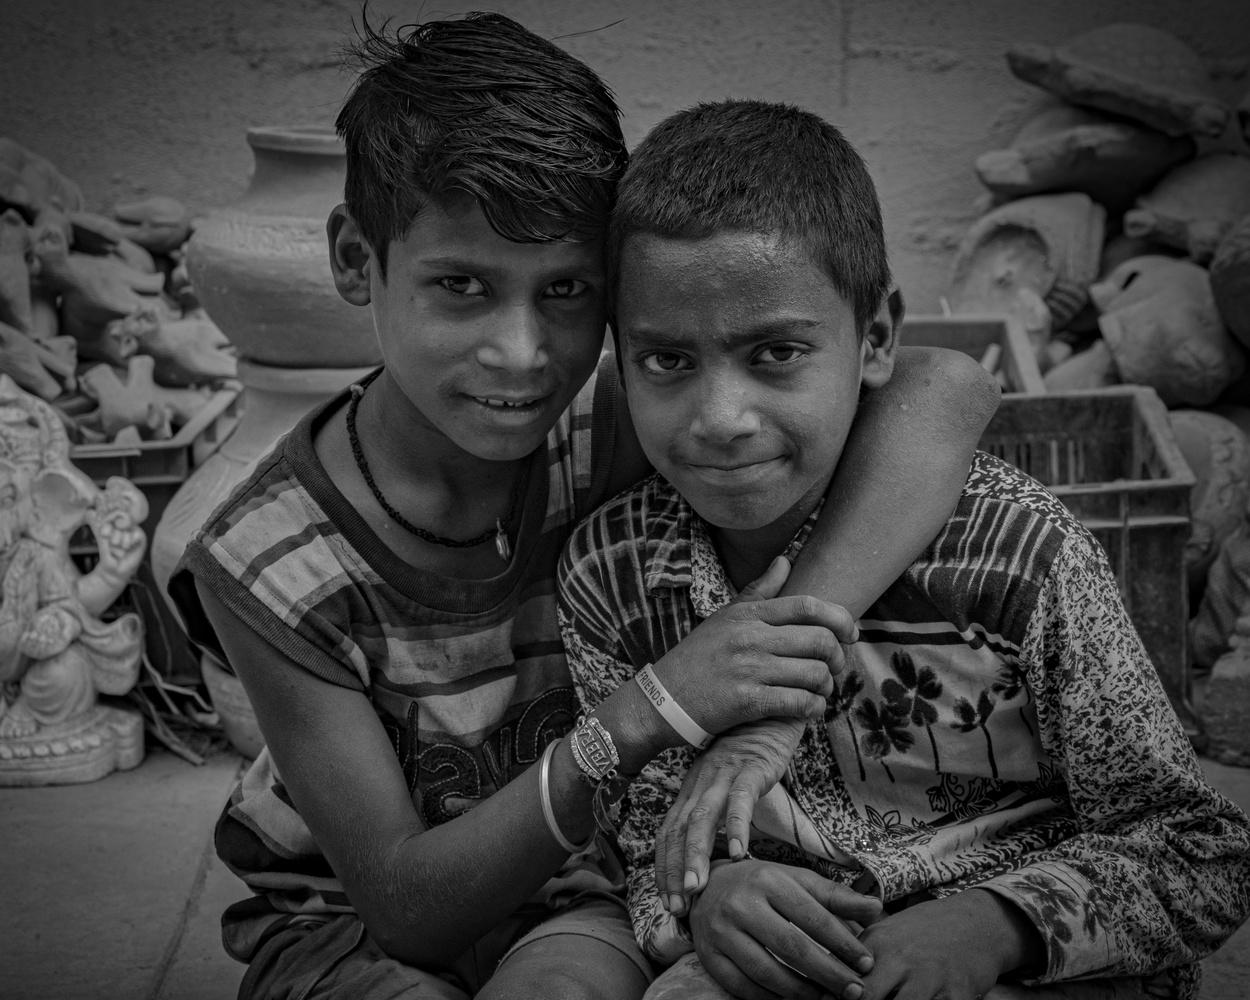 Happiness by Chaitnya Shrivastava